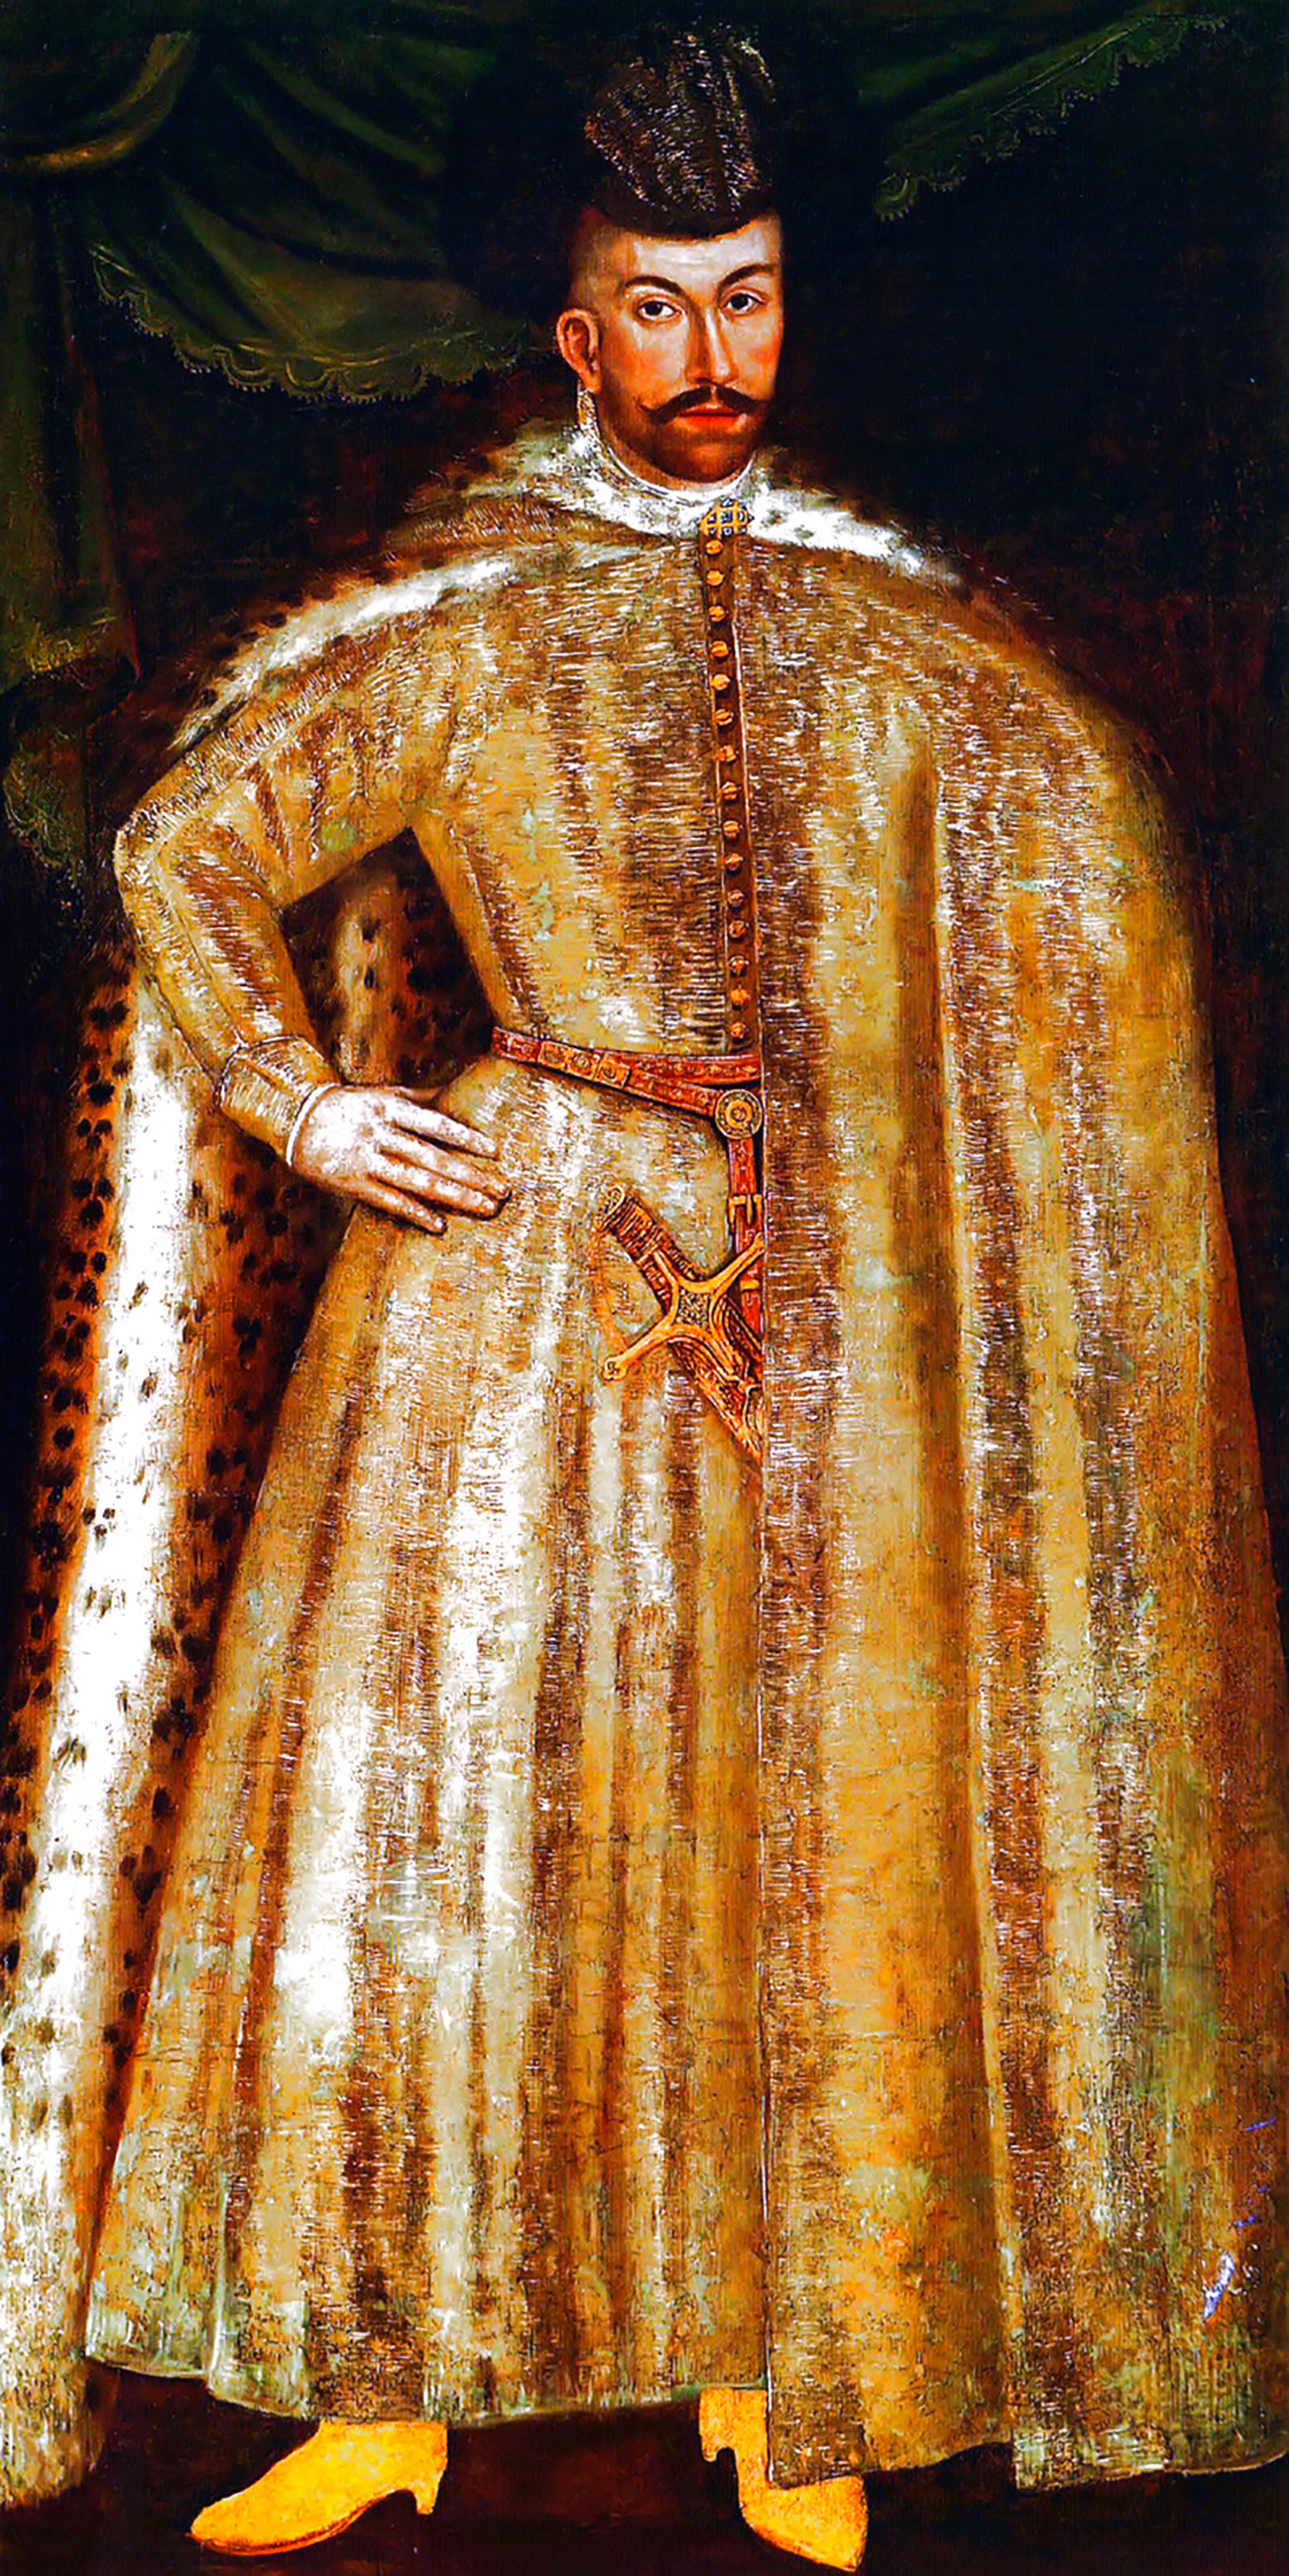 Simeon Bekbulatowitsch